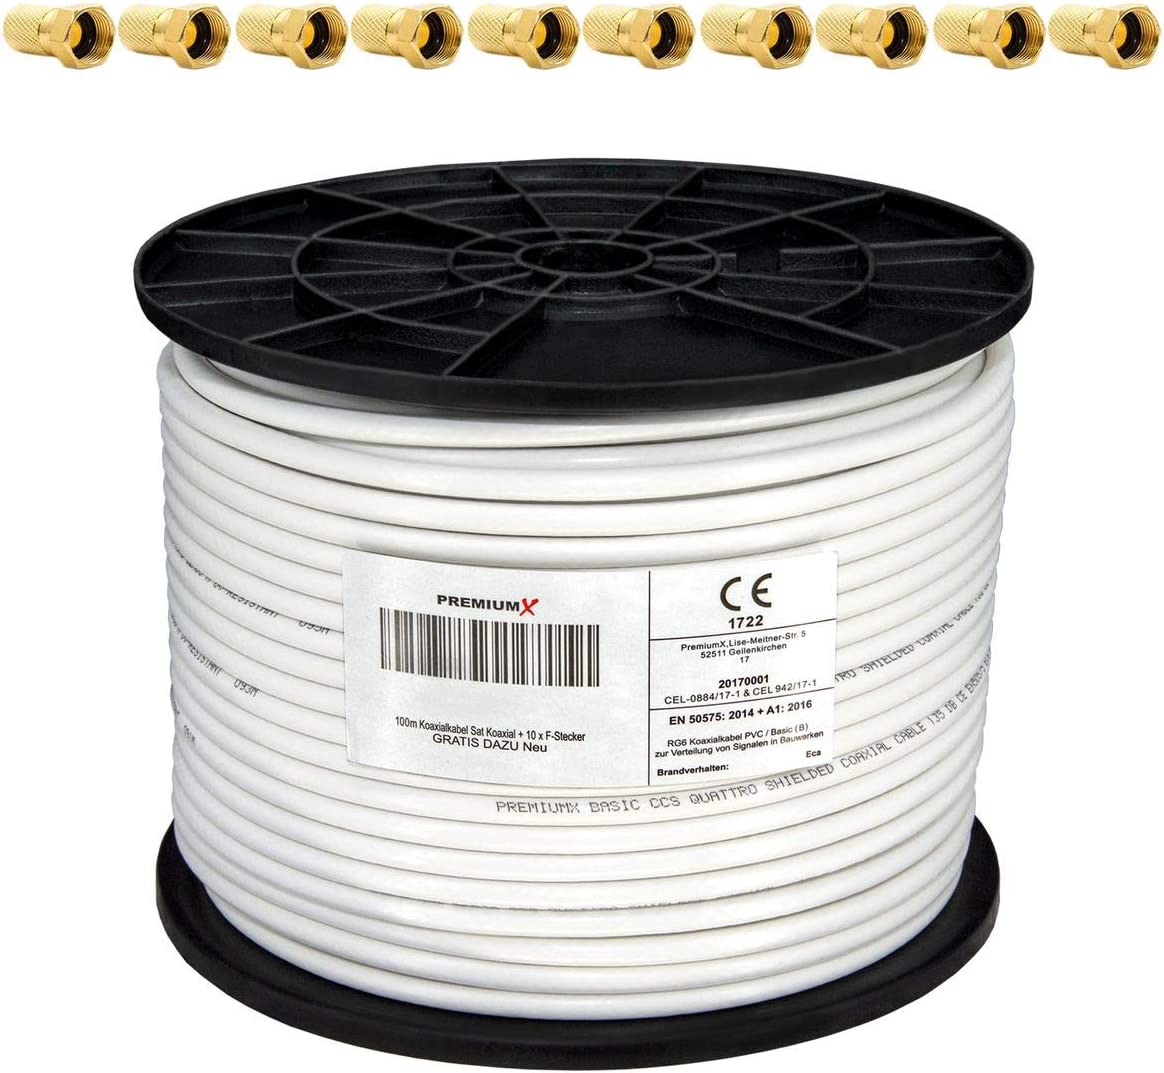 PremiumX 100m 135dB cable coaxial satelital cobre puro digital profesional Full HD Ultra HD 4K 4 veces protegido para sistemas DVB-S / S2 DVB-C DVB-T ...